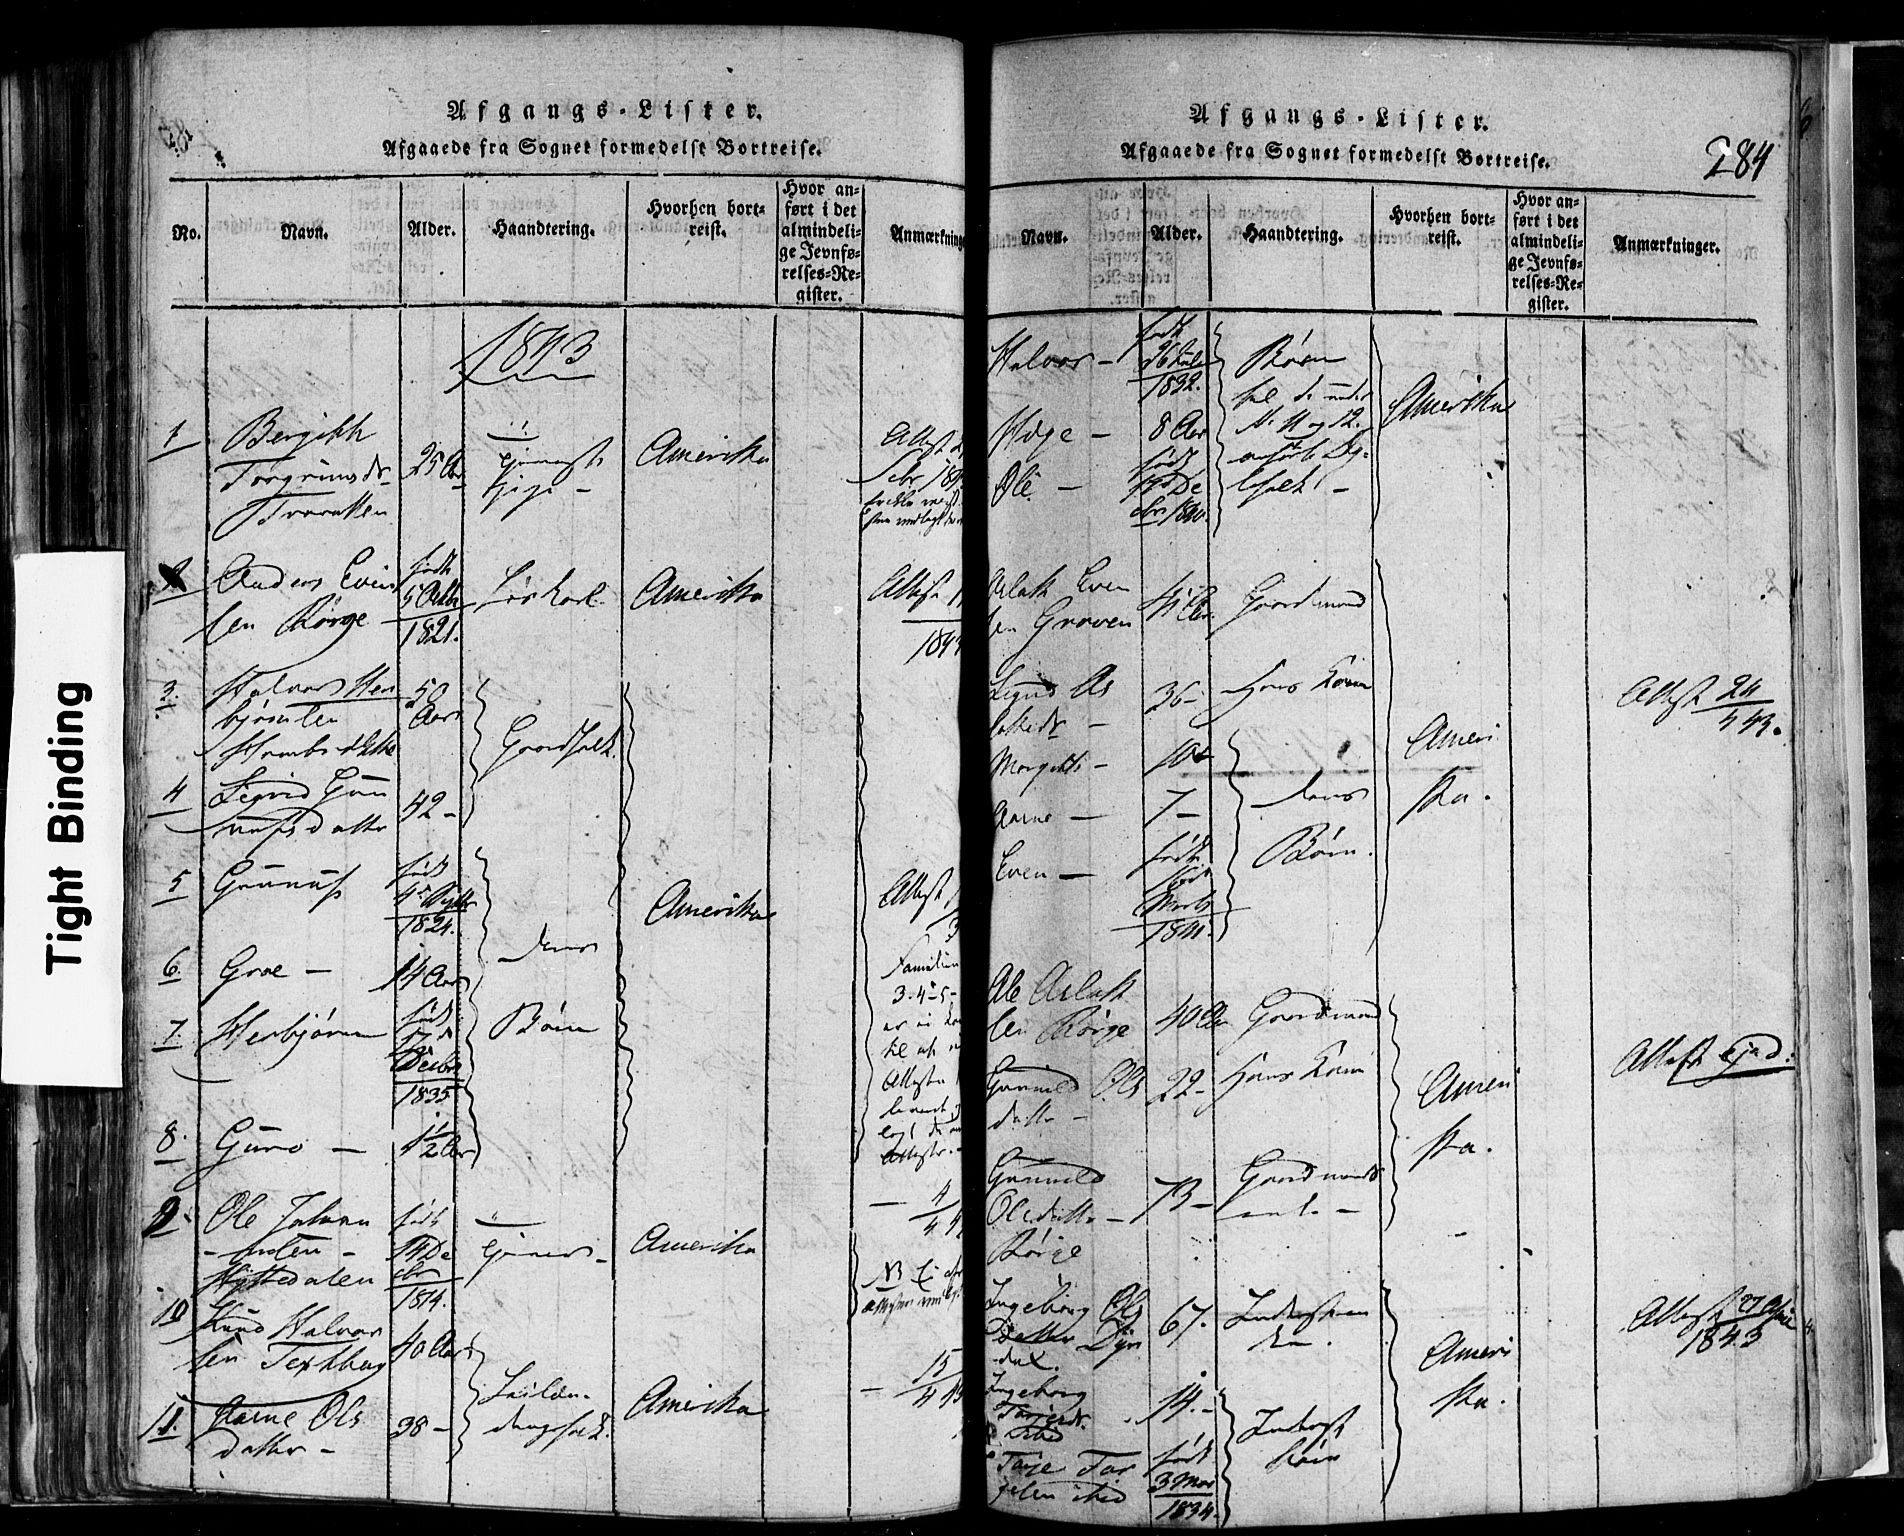 SAKO, Rauland kirkebøker, F/Fa/L0002: Ministerialbok nr. 2, 1815-1860, s. 284